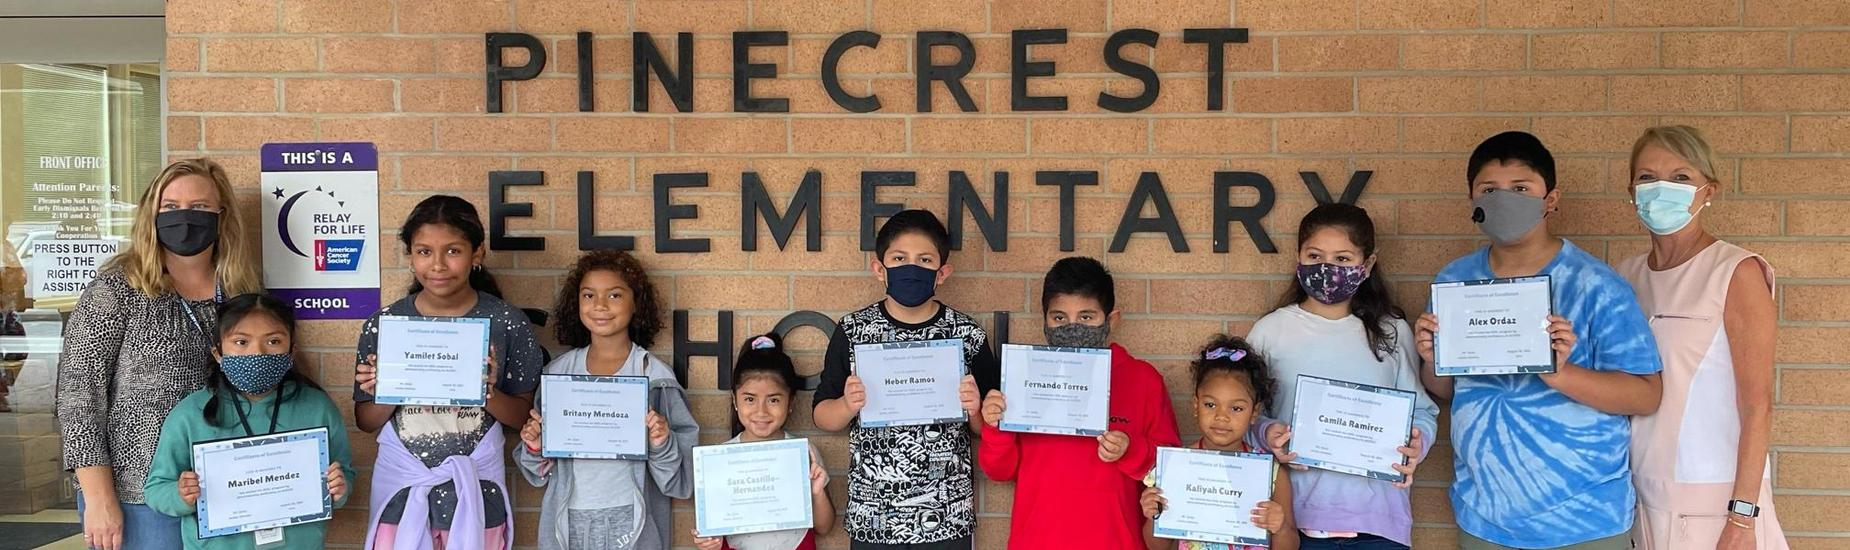 Pinecrest Elementary ESOL Students Awarded